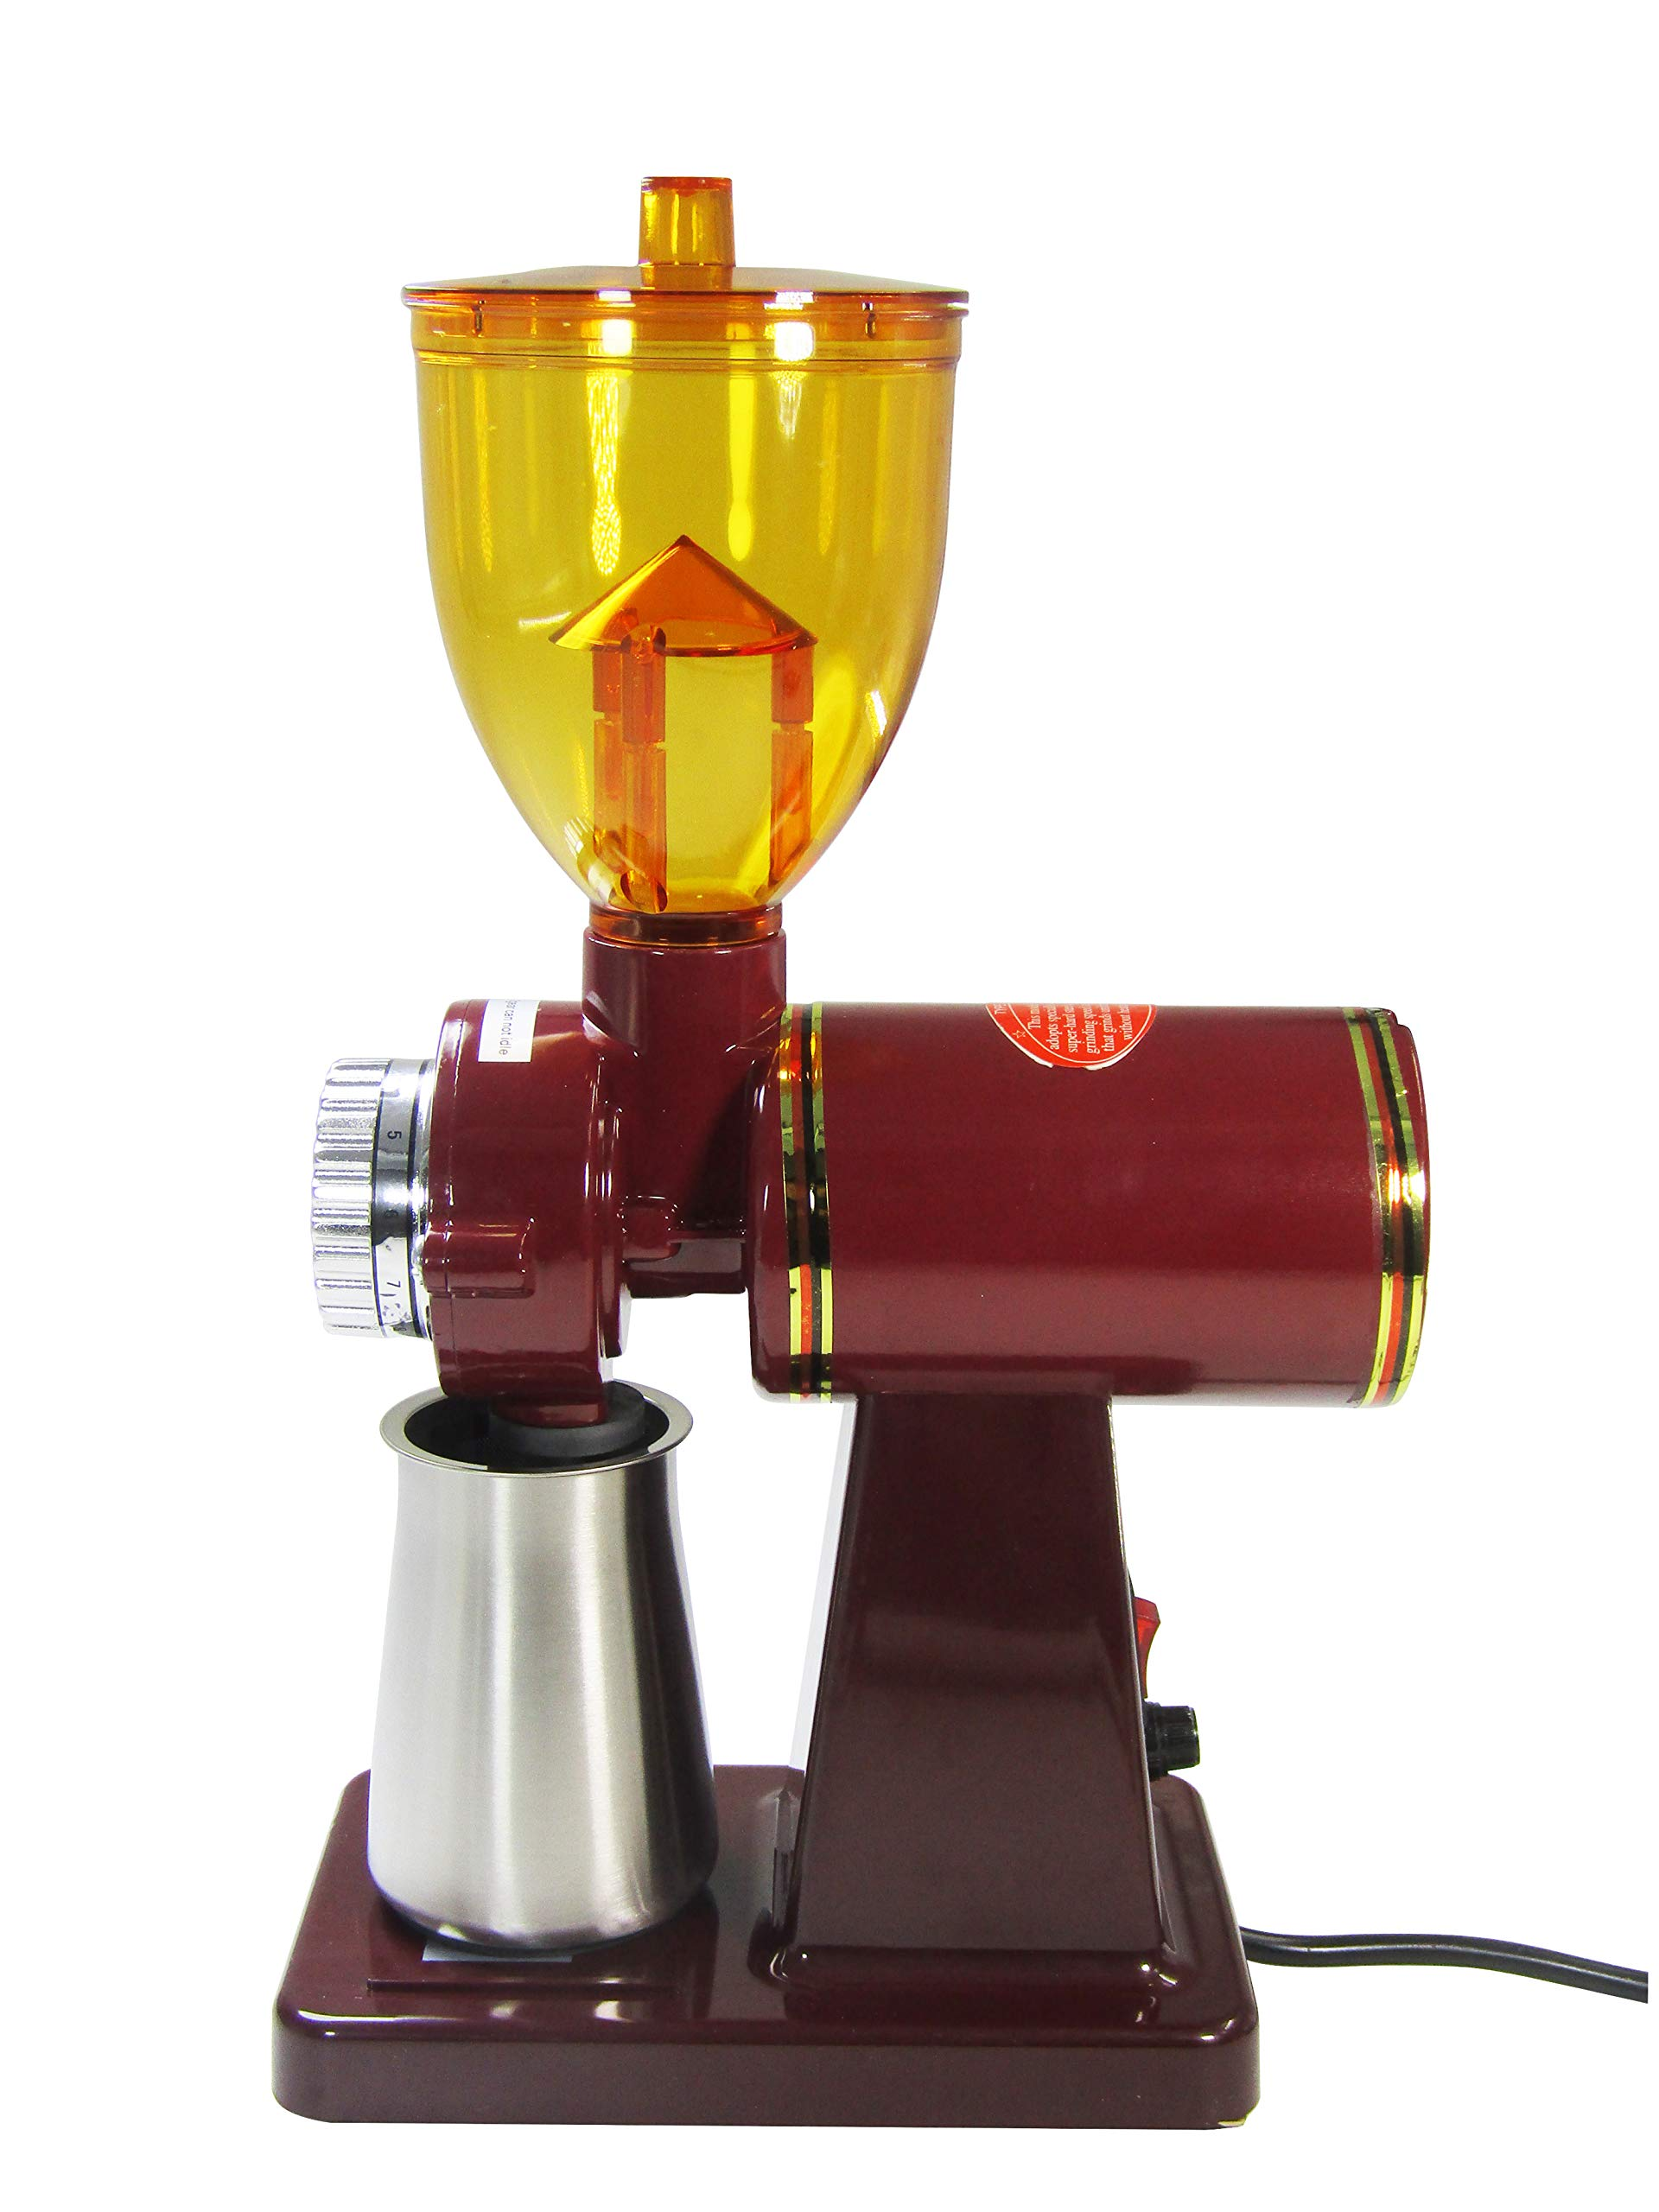 JIAWANSHUN 250g Automatic Coffee Burr Grinder Coffee Burr Mill Coffee Bean Grinder (110V, Red) by JIAWANSHUN